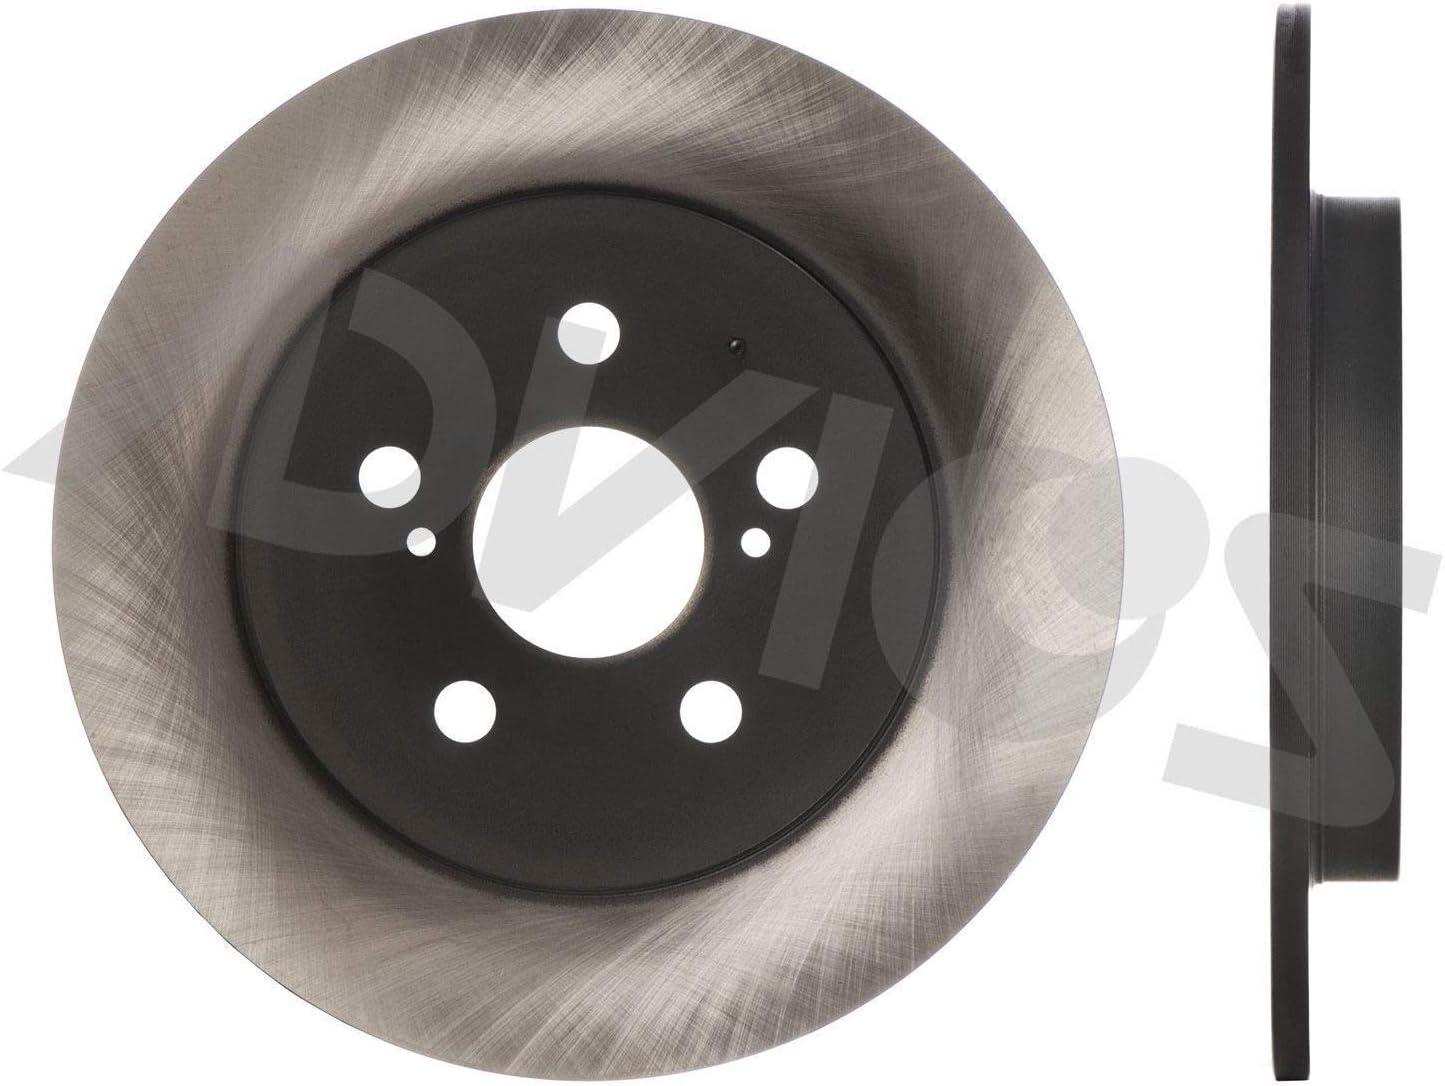 Advics A6R041 Disc Brake Lot trust of Rotor service 3